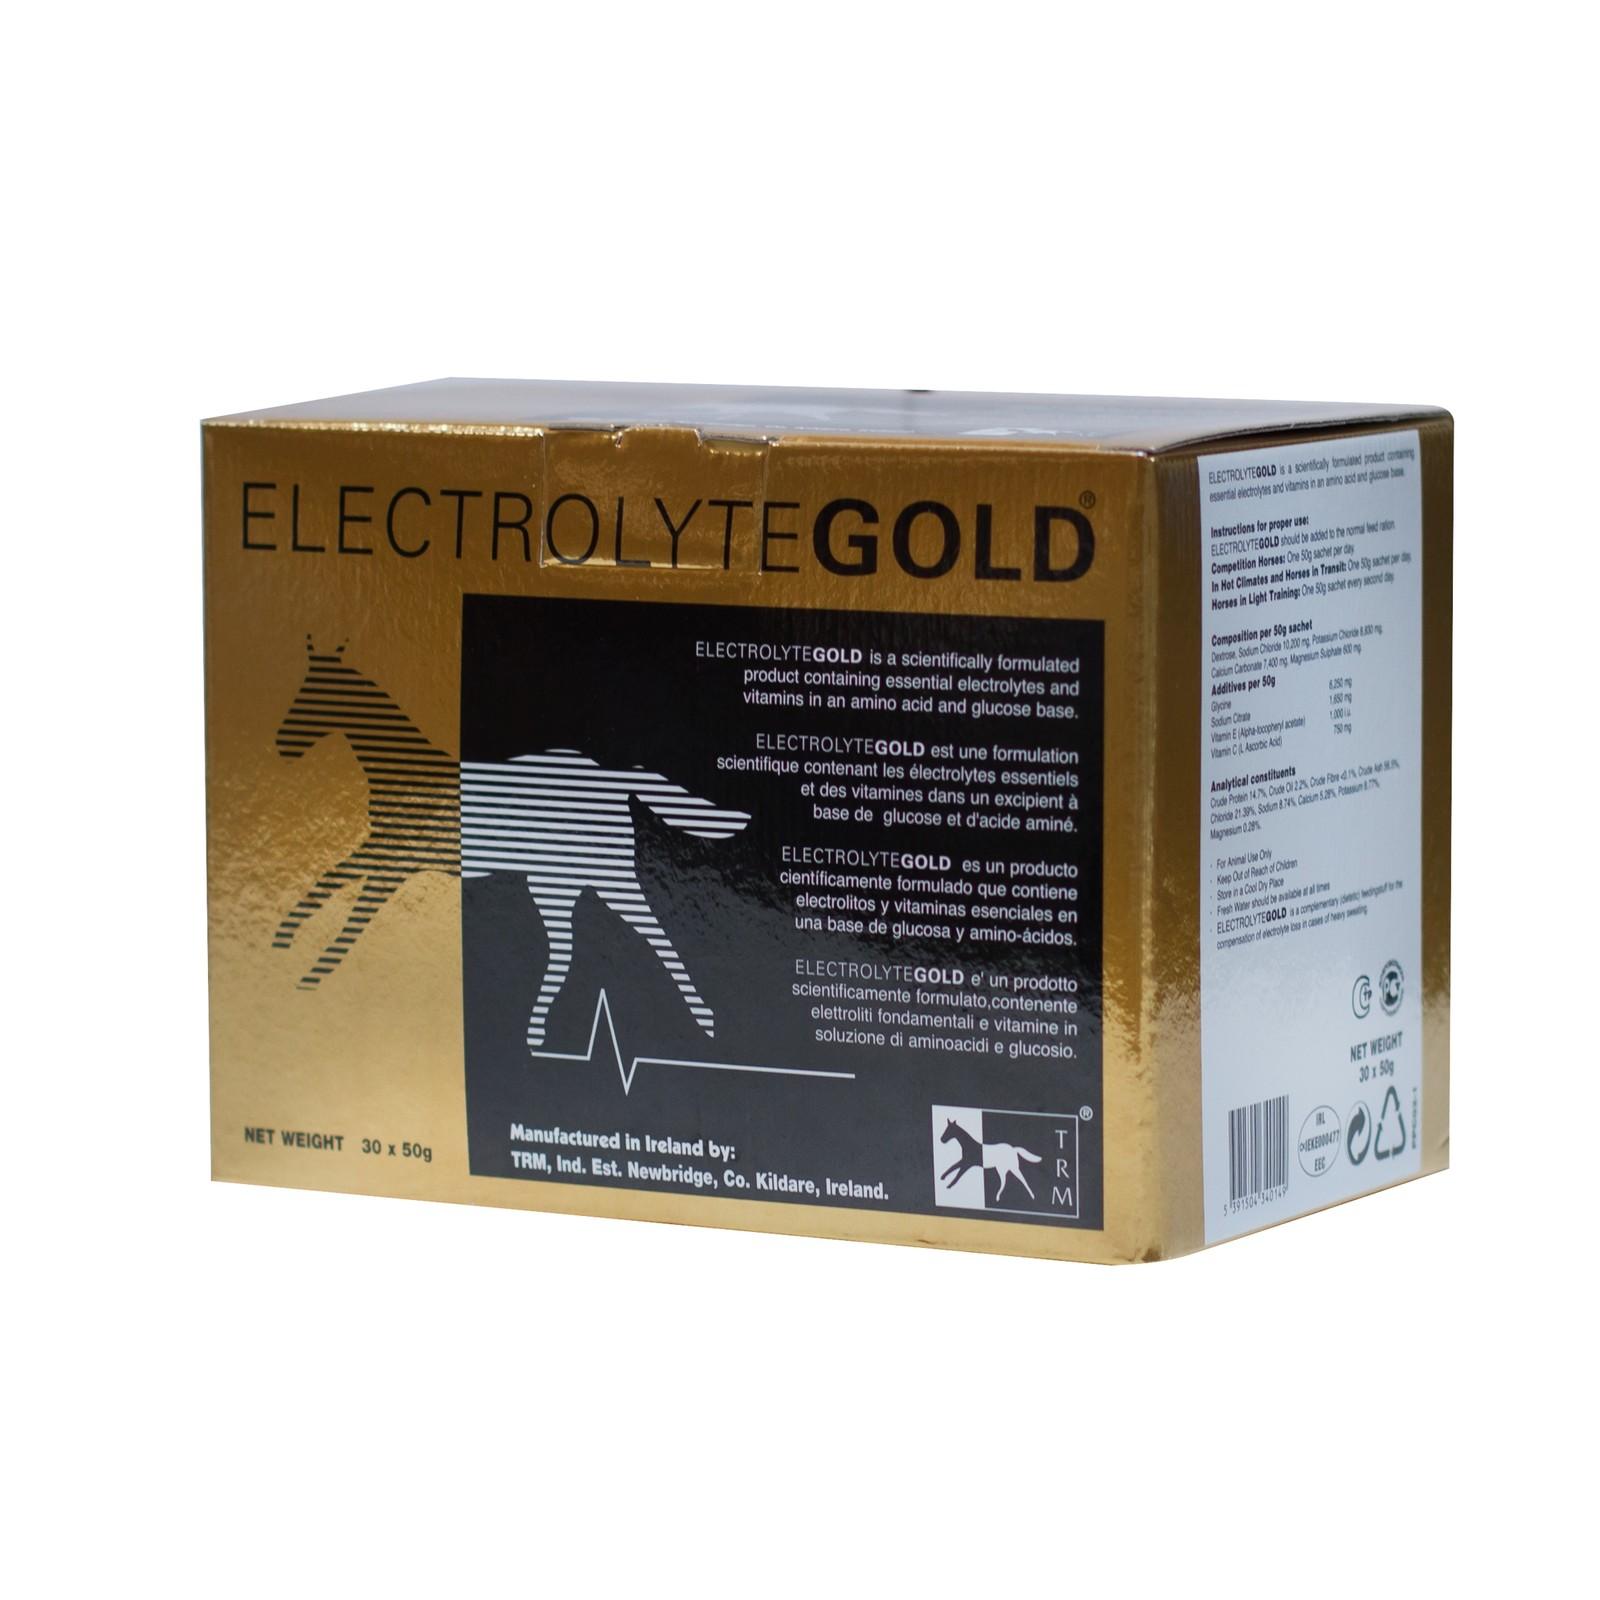 TRM ELECTROLYTE GOLD - DocHorse